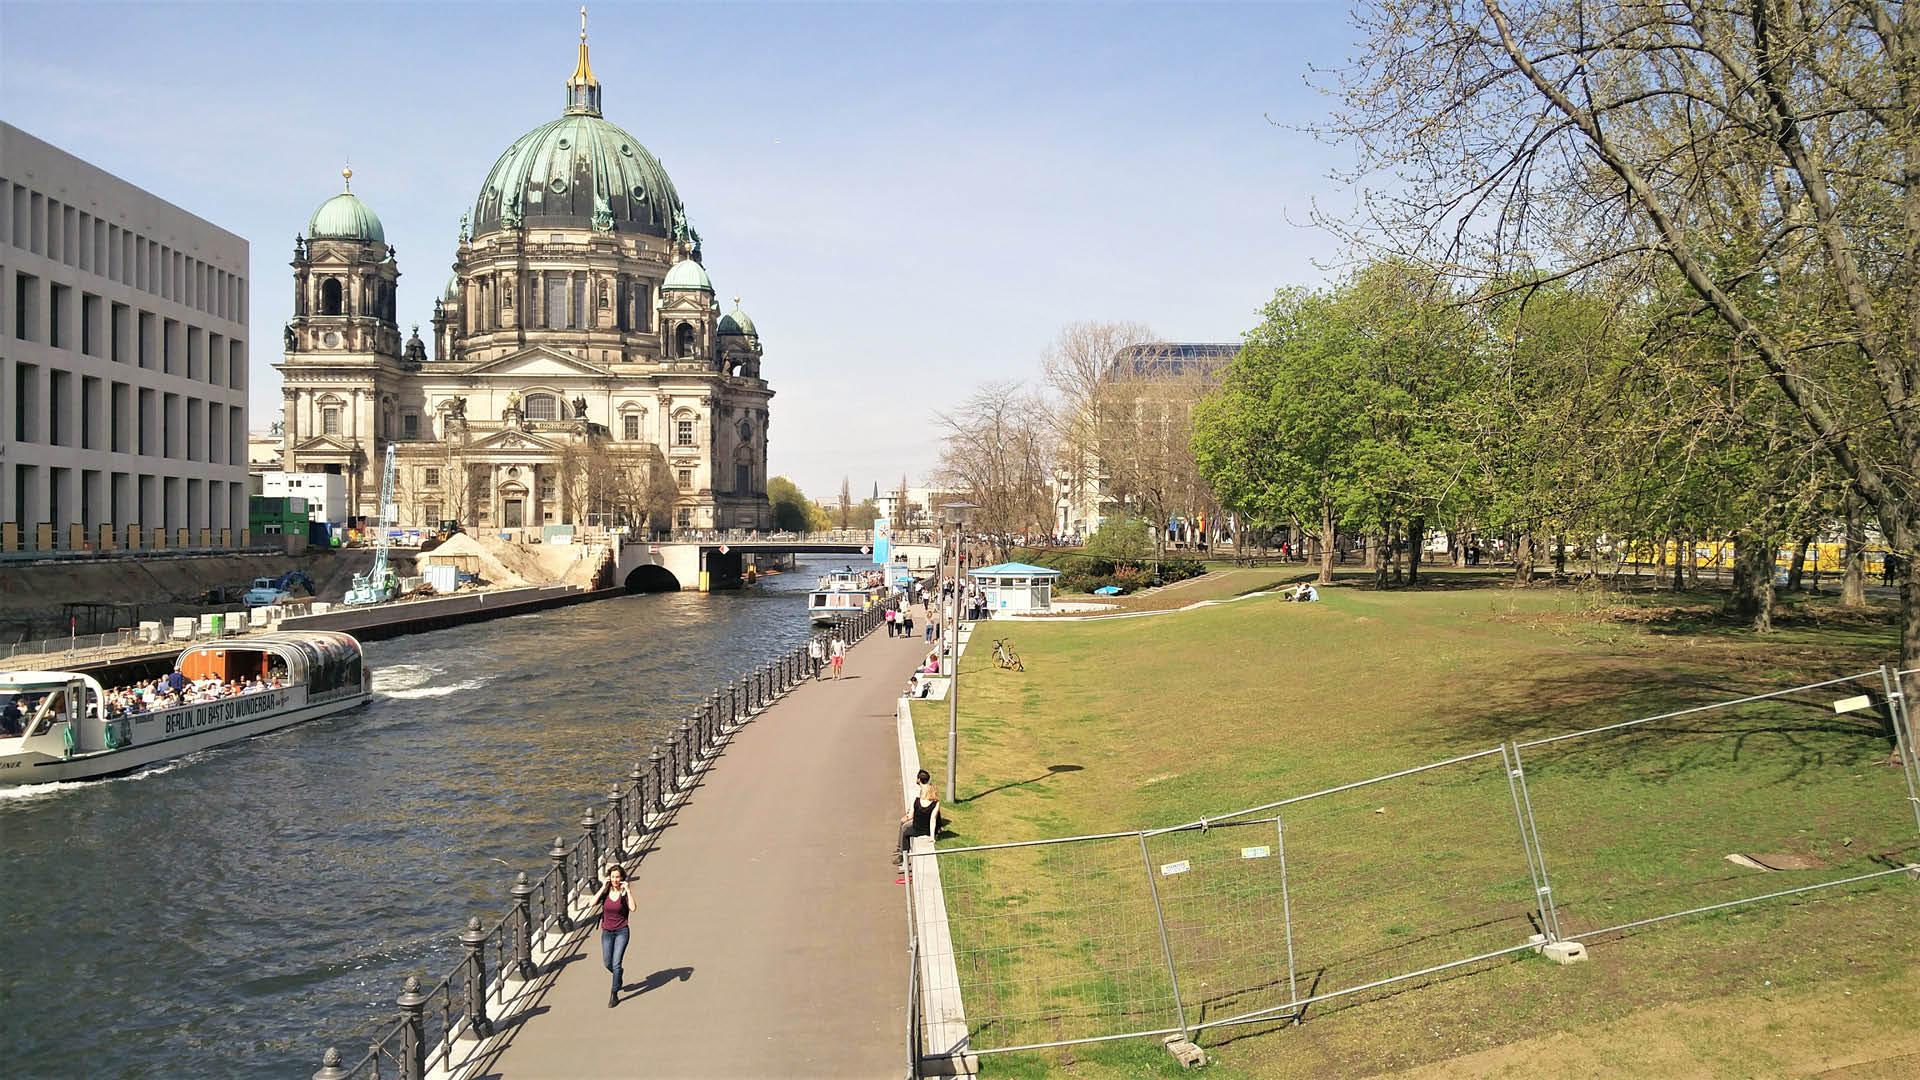 17 18 6 Exkursion Berlin